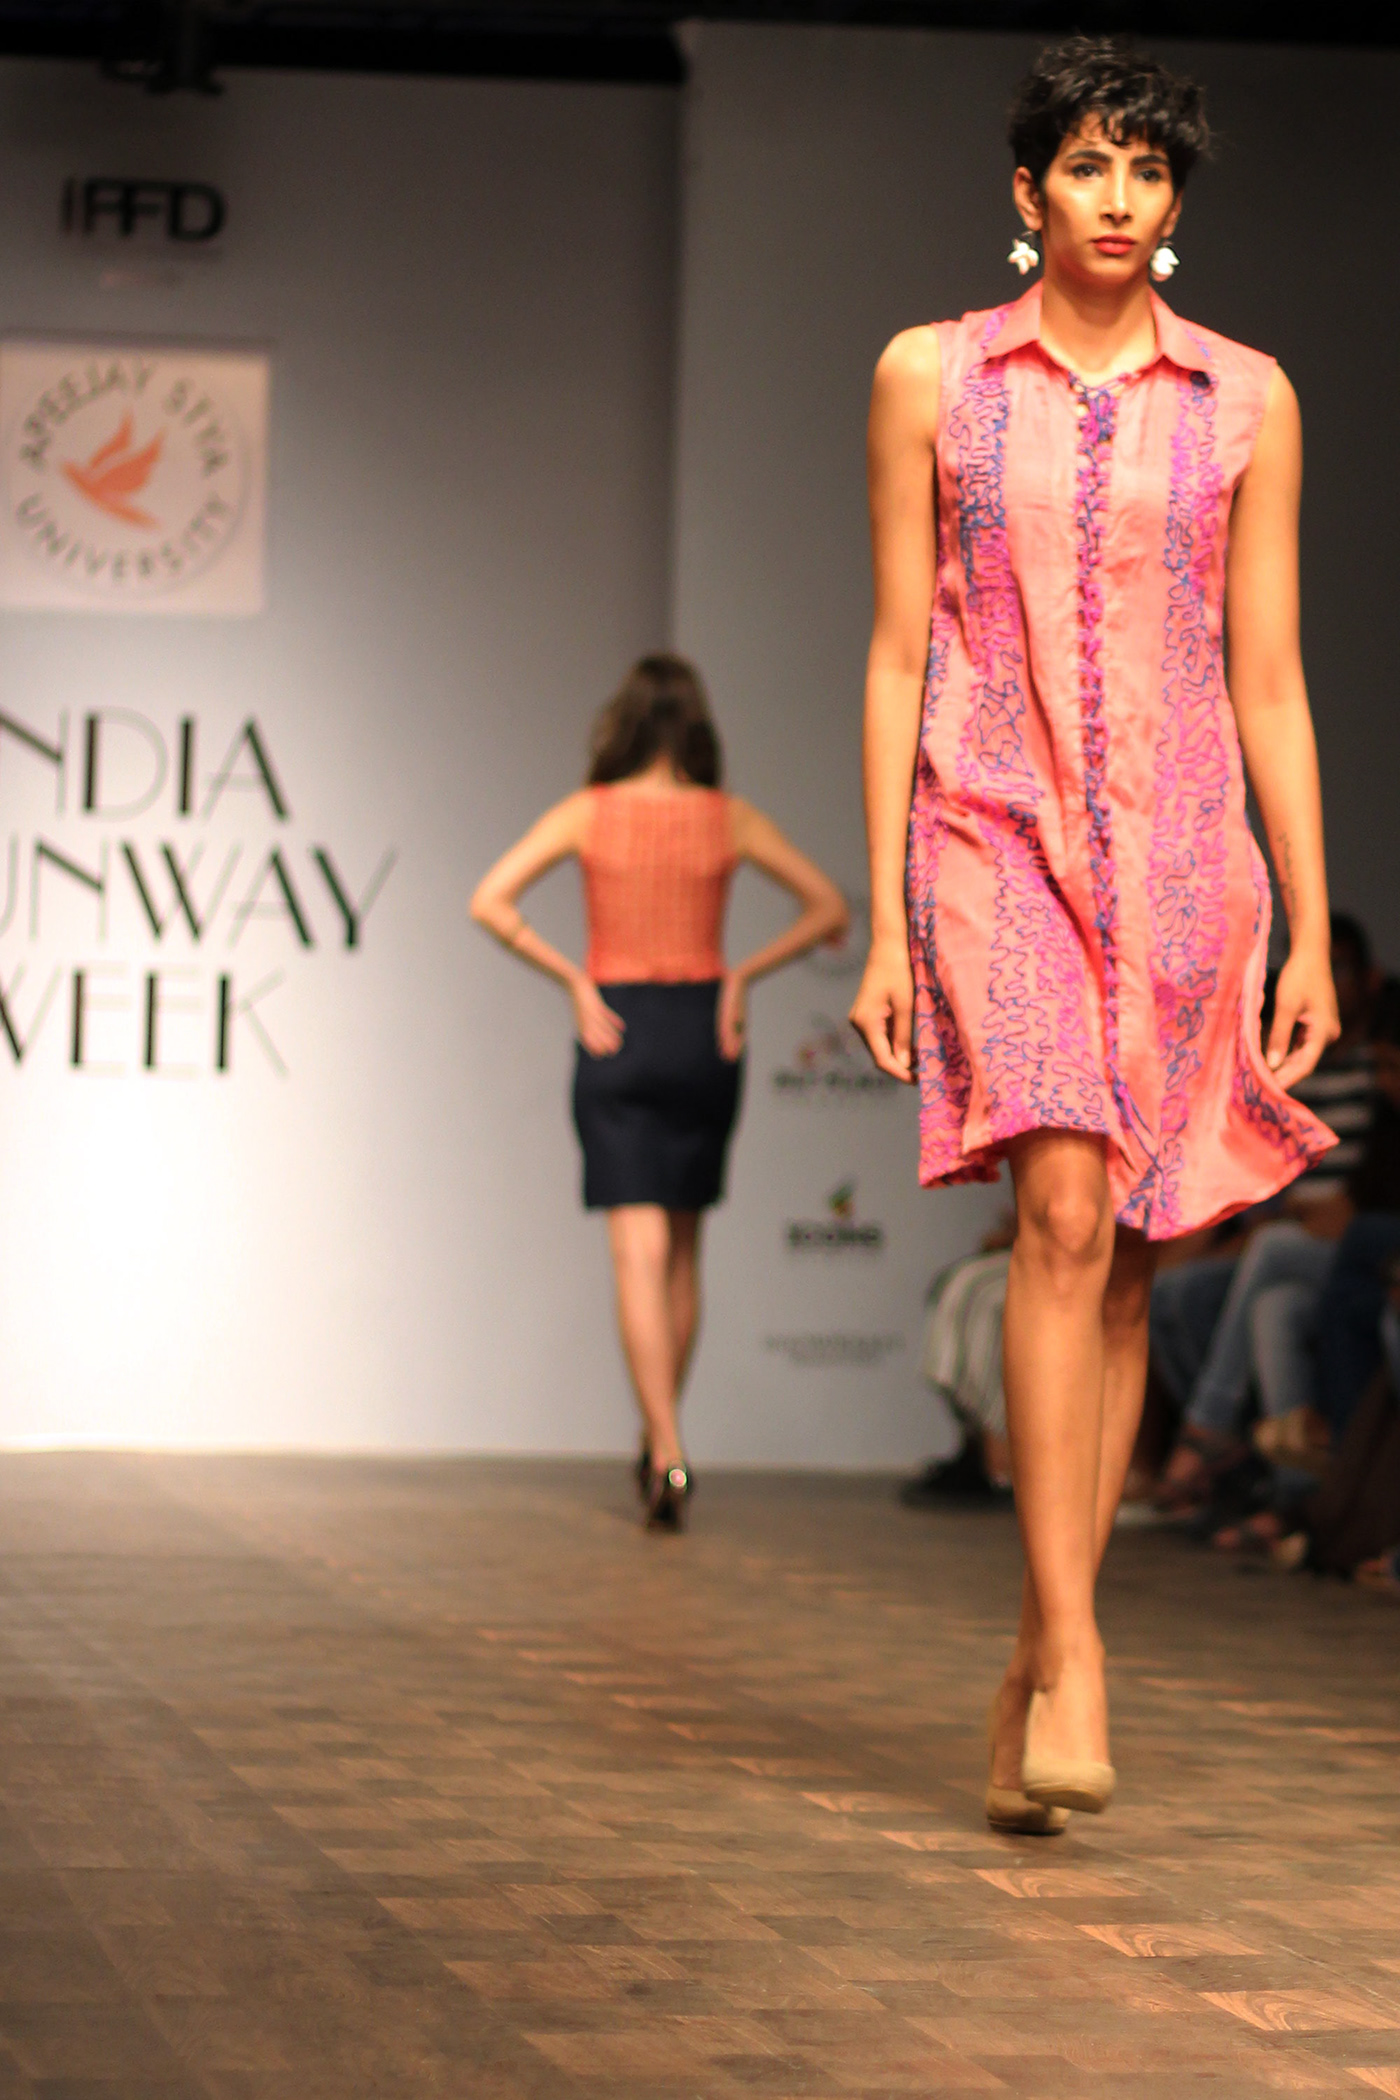 indiarunwayweek summeredition2018 Resortwear